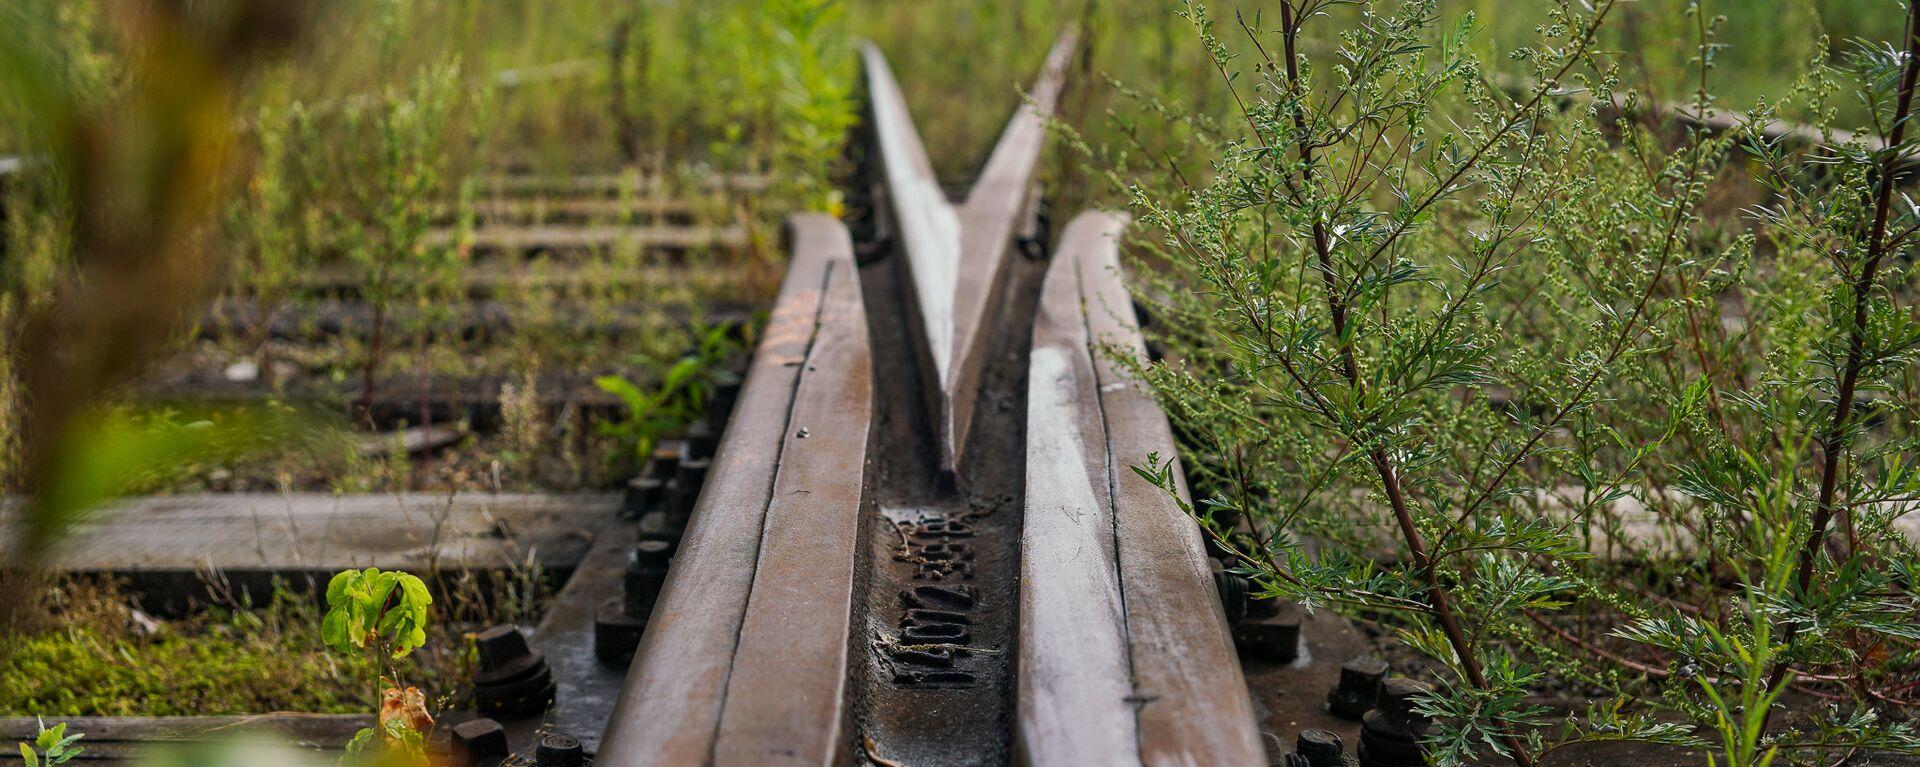 Железная дорога - Sputnik Latvija, 1920, 17.04.2021